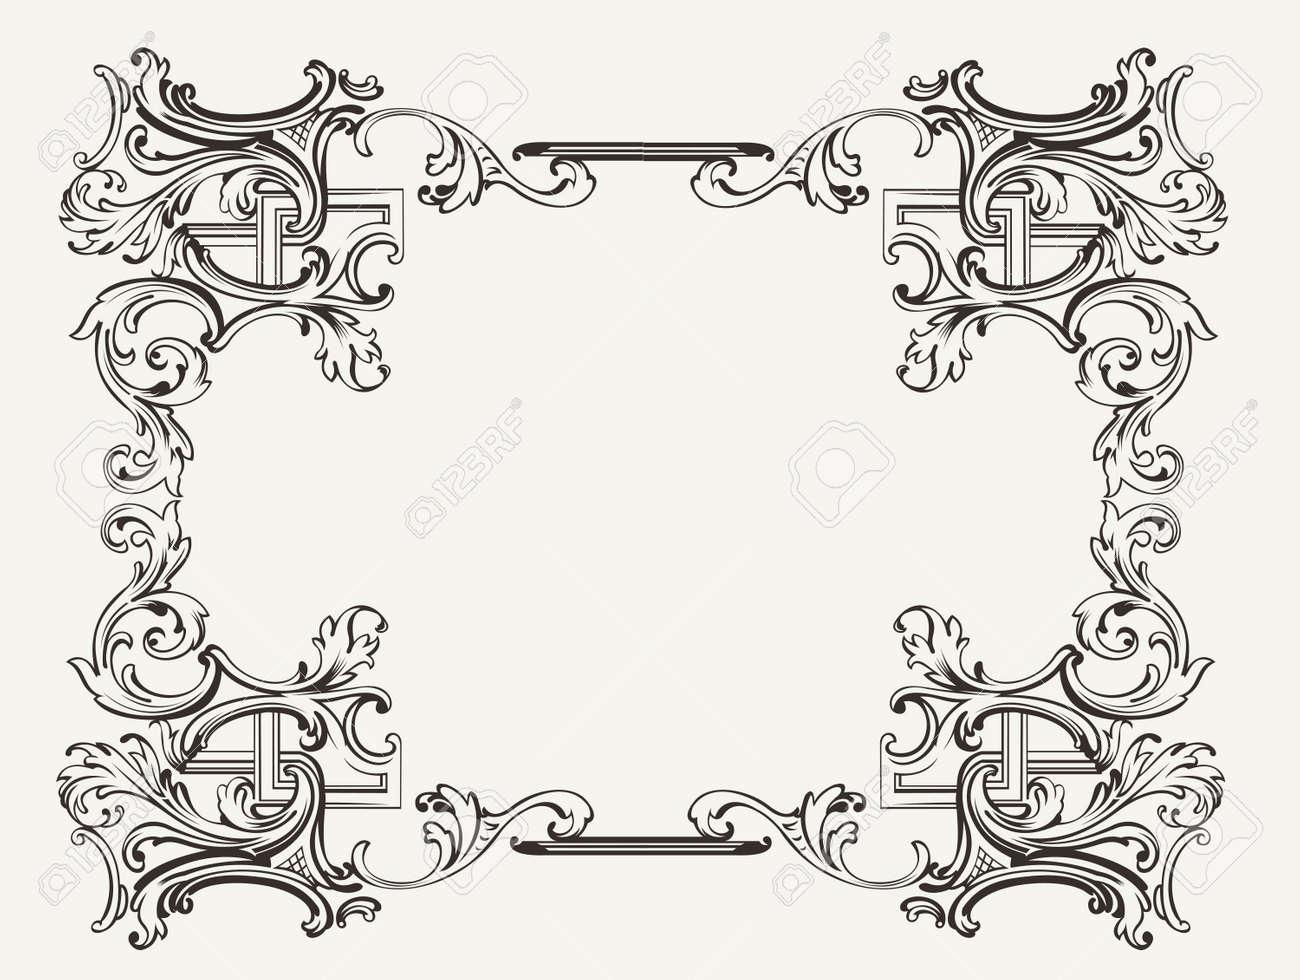 Original Renaissance Ornate Frame Royalty Free Cliparts, Vectors ...